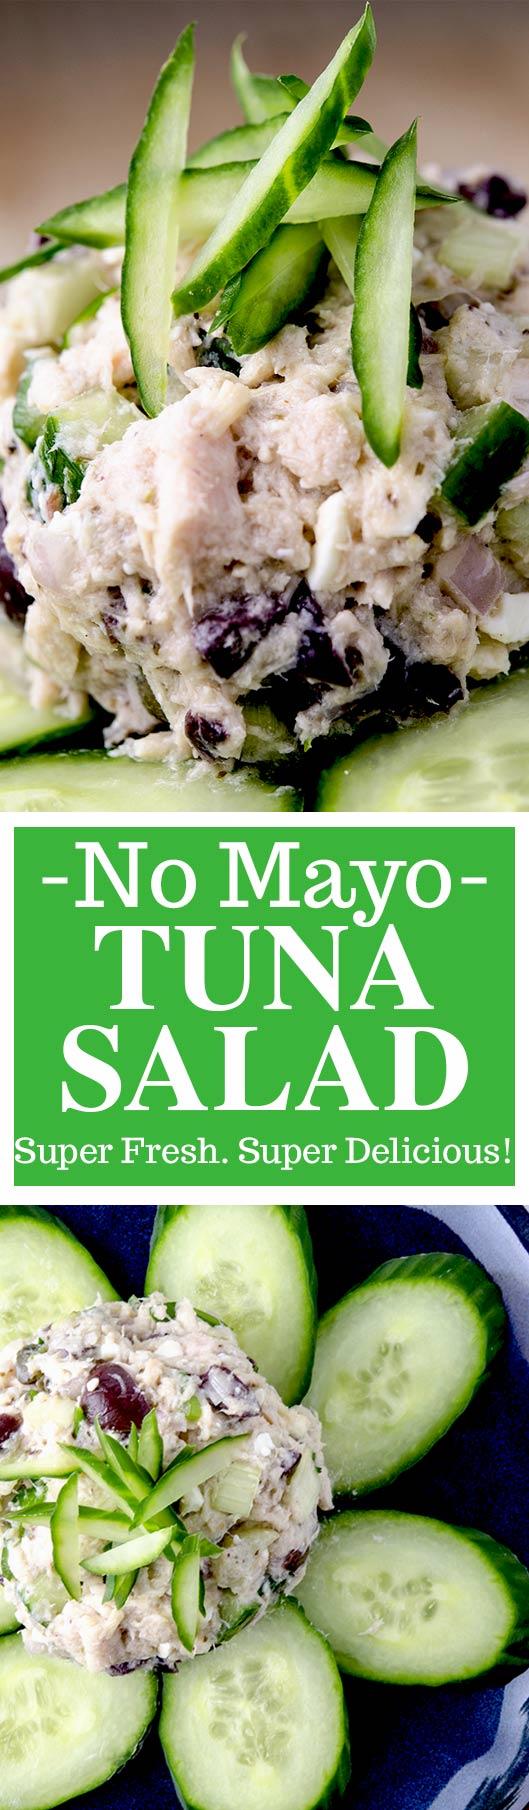 The perfect Mediterranean No Mayo Tuna Salad Recipe. With fresh citrus, kalamata olives, feta and more... you have to check out this tuna salad recipe.